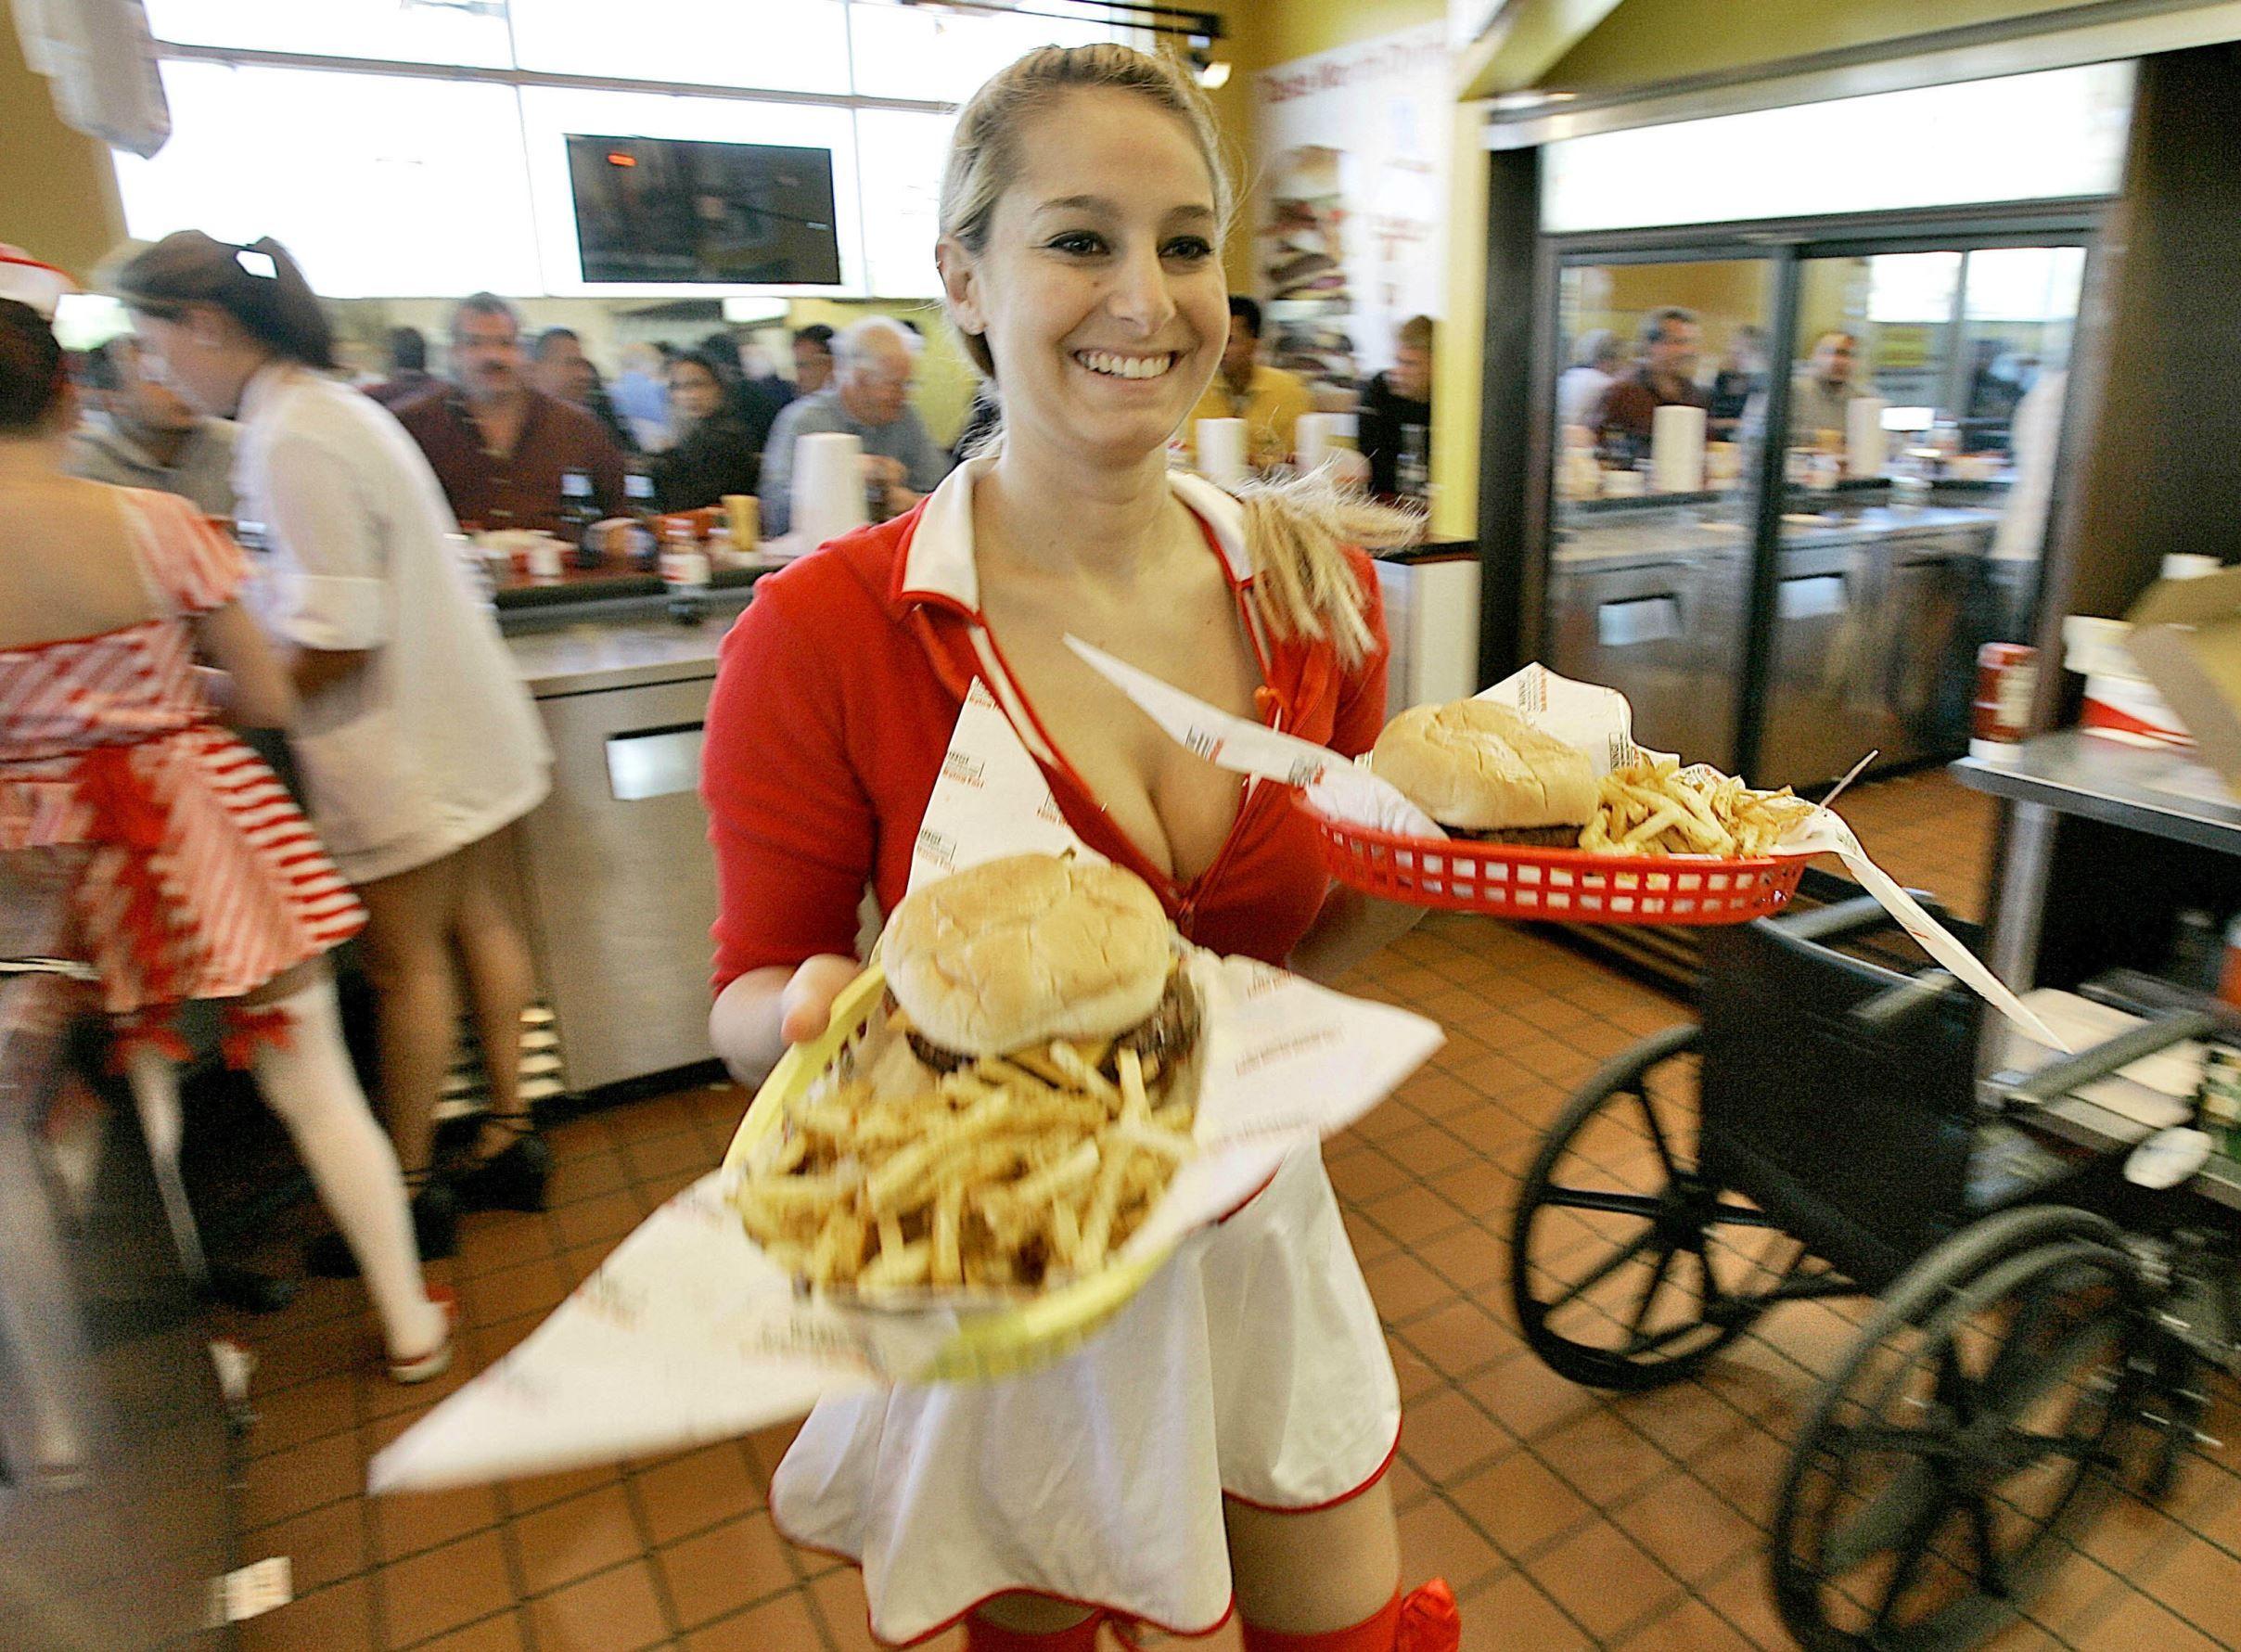 World S Weirdest Restaurants Restaurant Grill Restaurant Heart Attack Grill